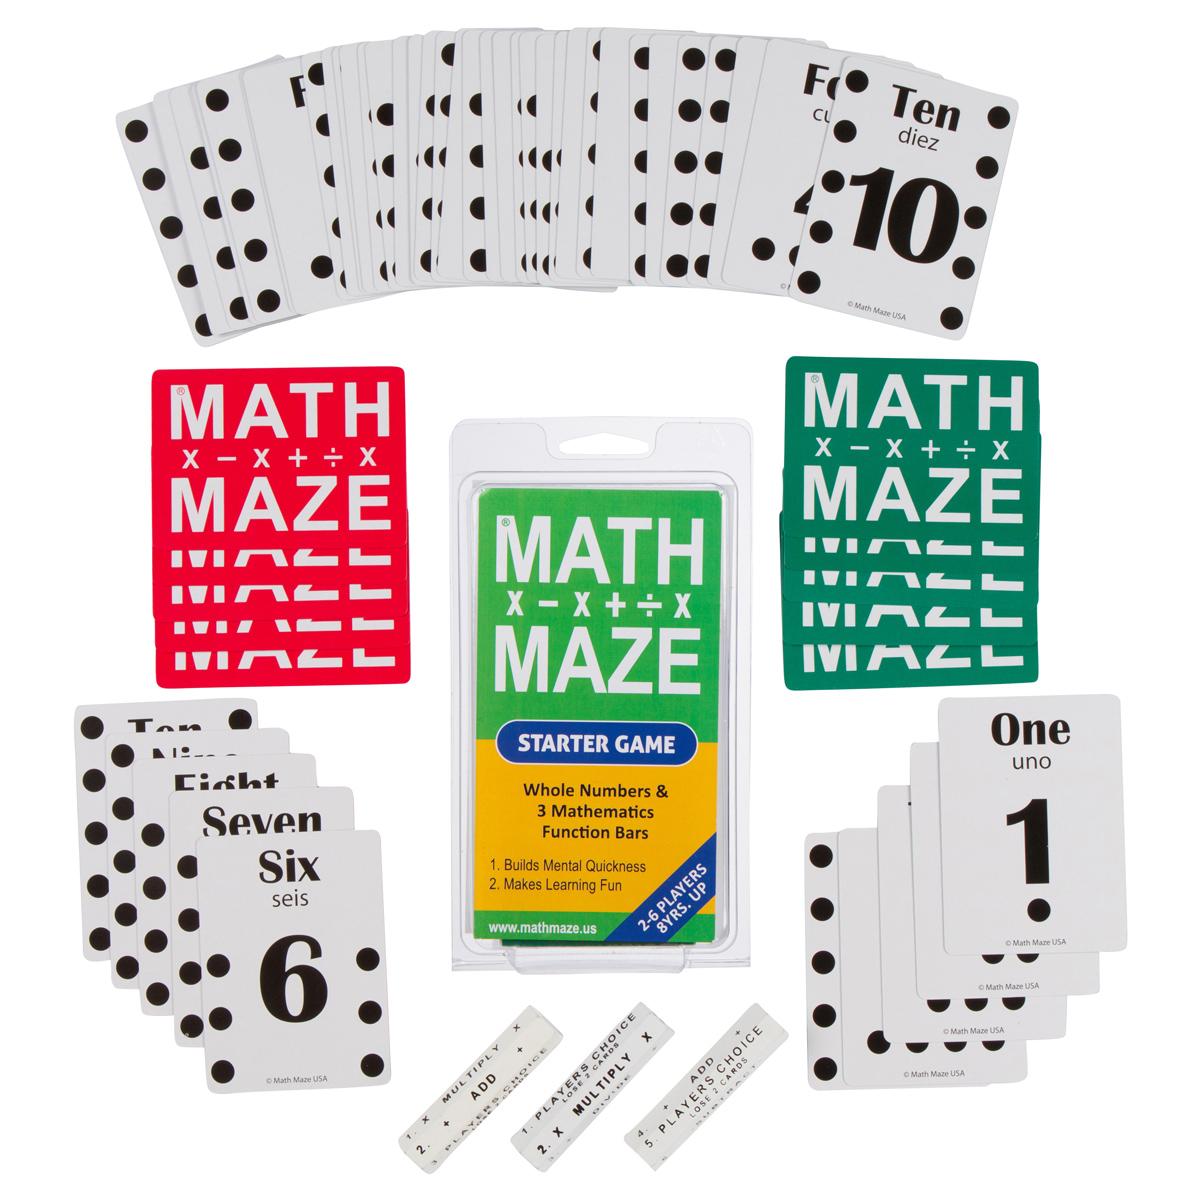 Math Maze Starter Game